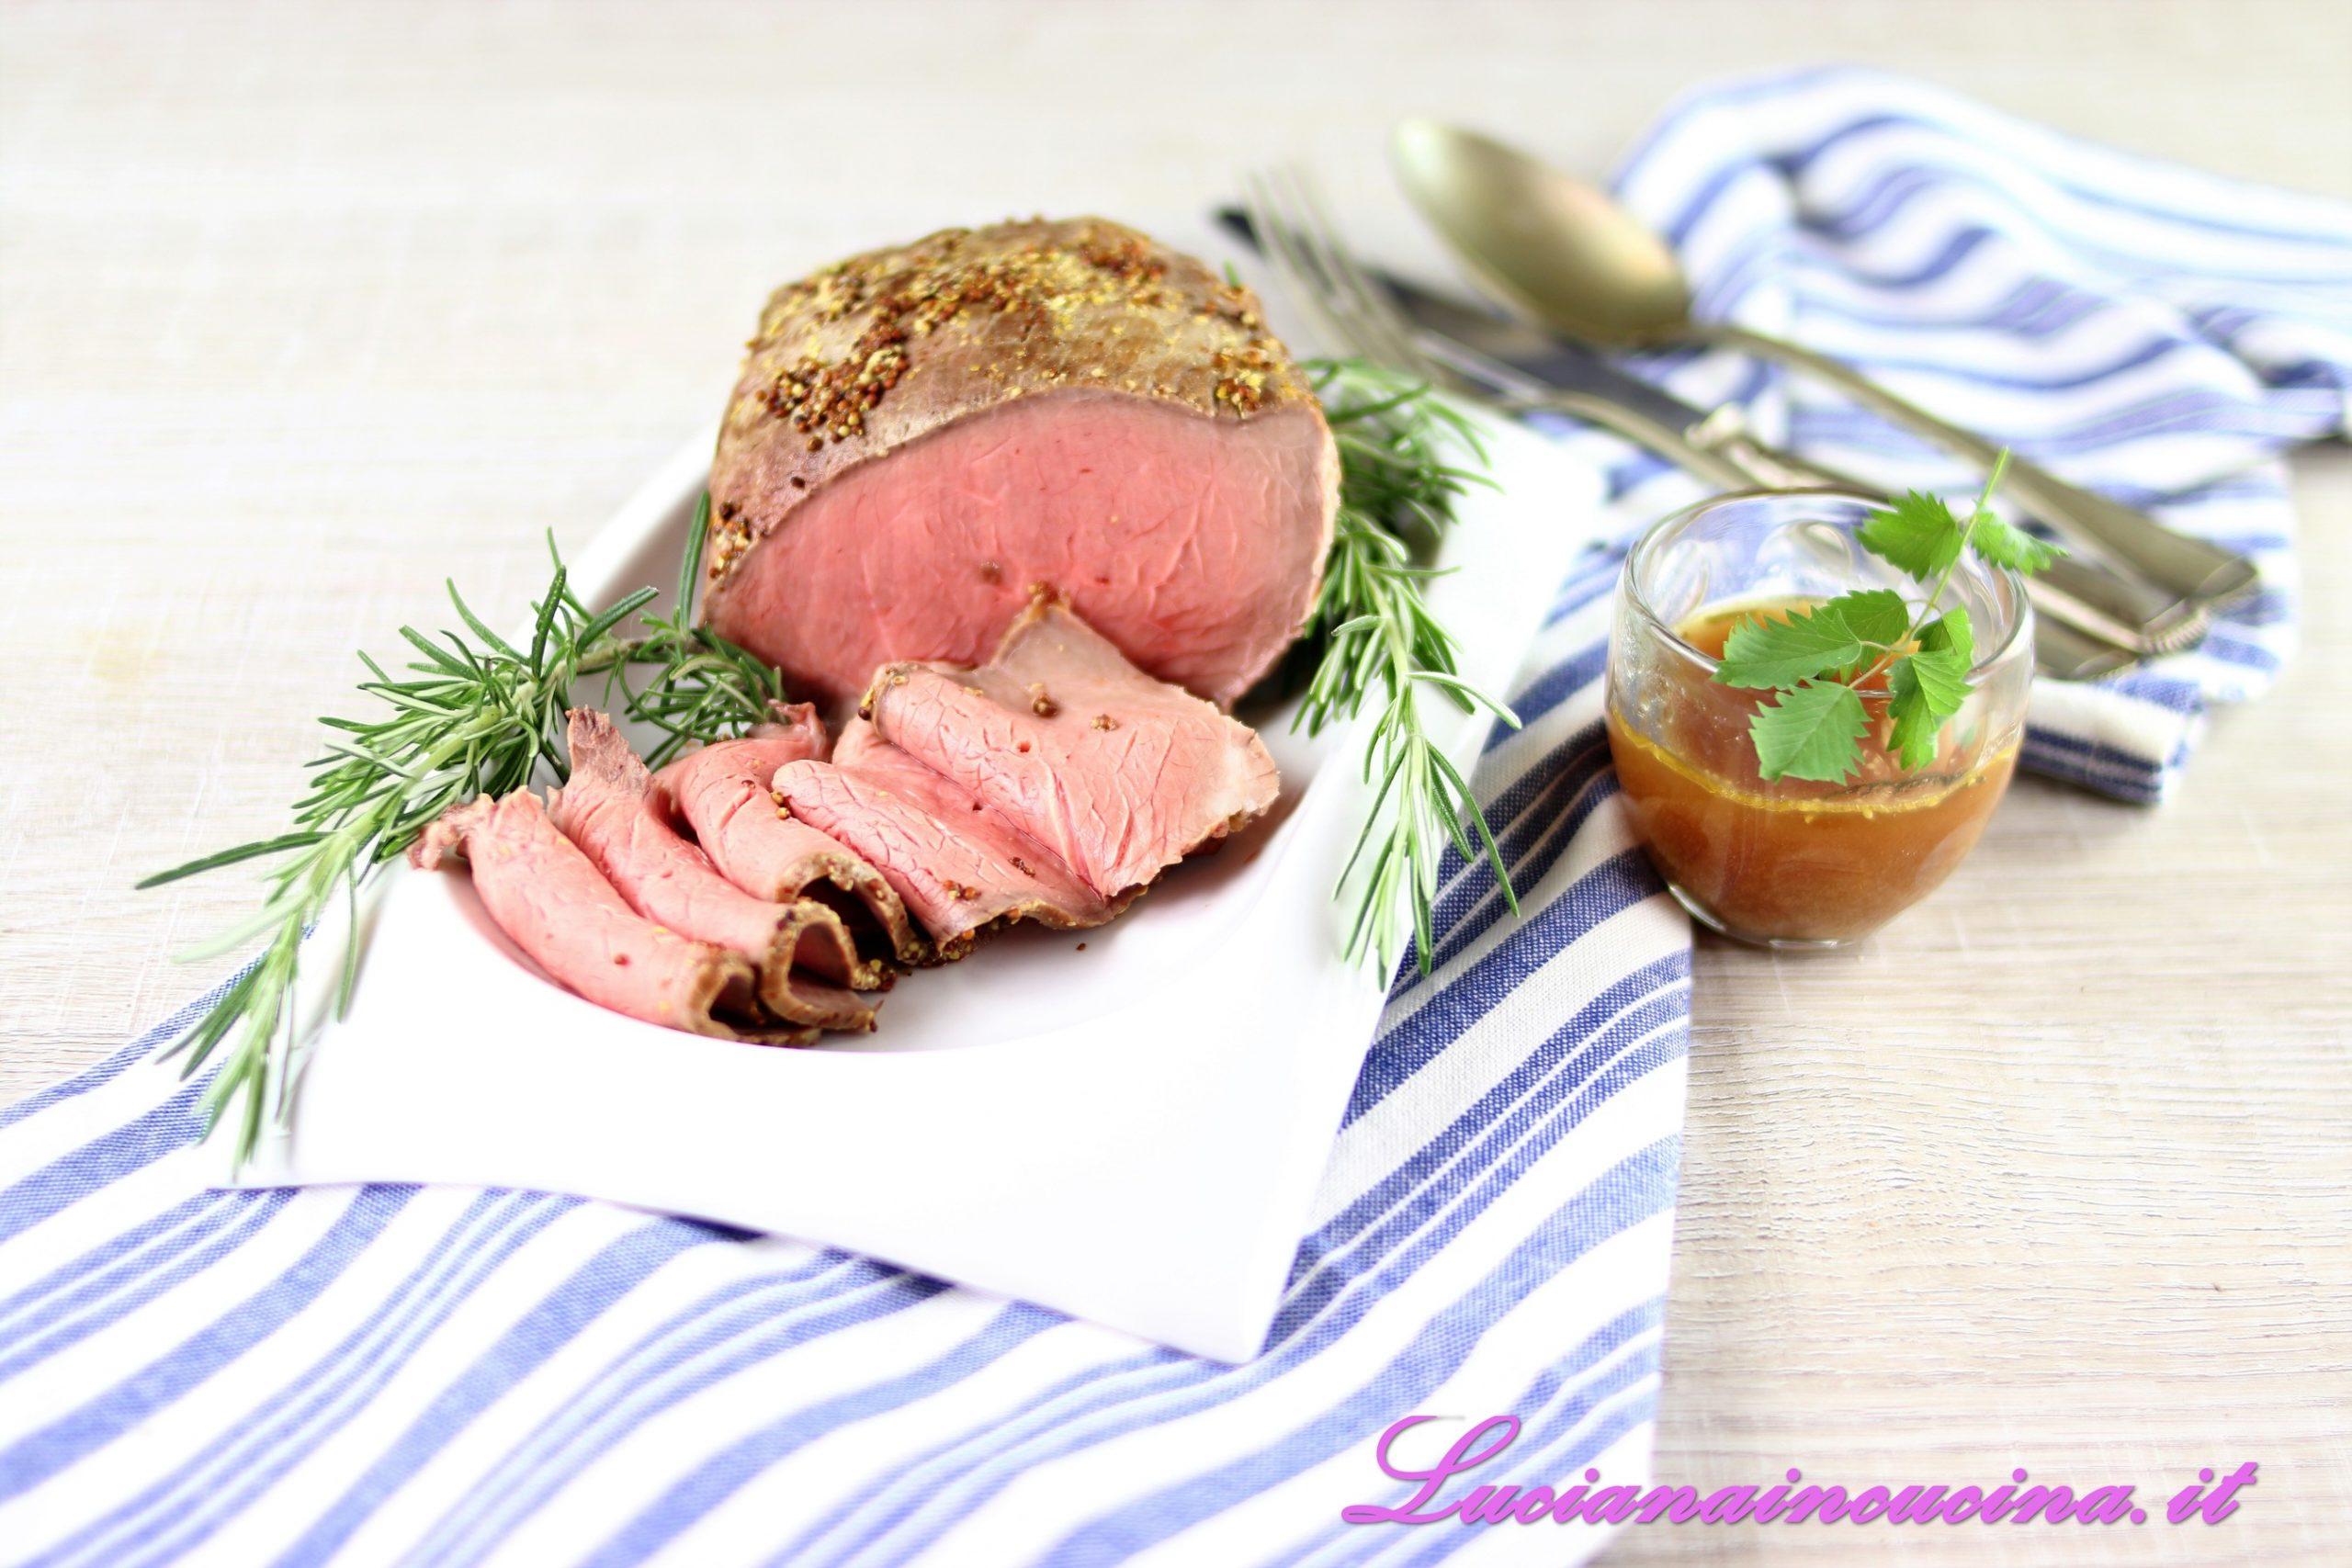 Roast beef cotto a bassa temperatura